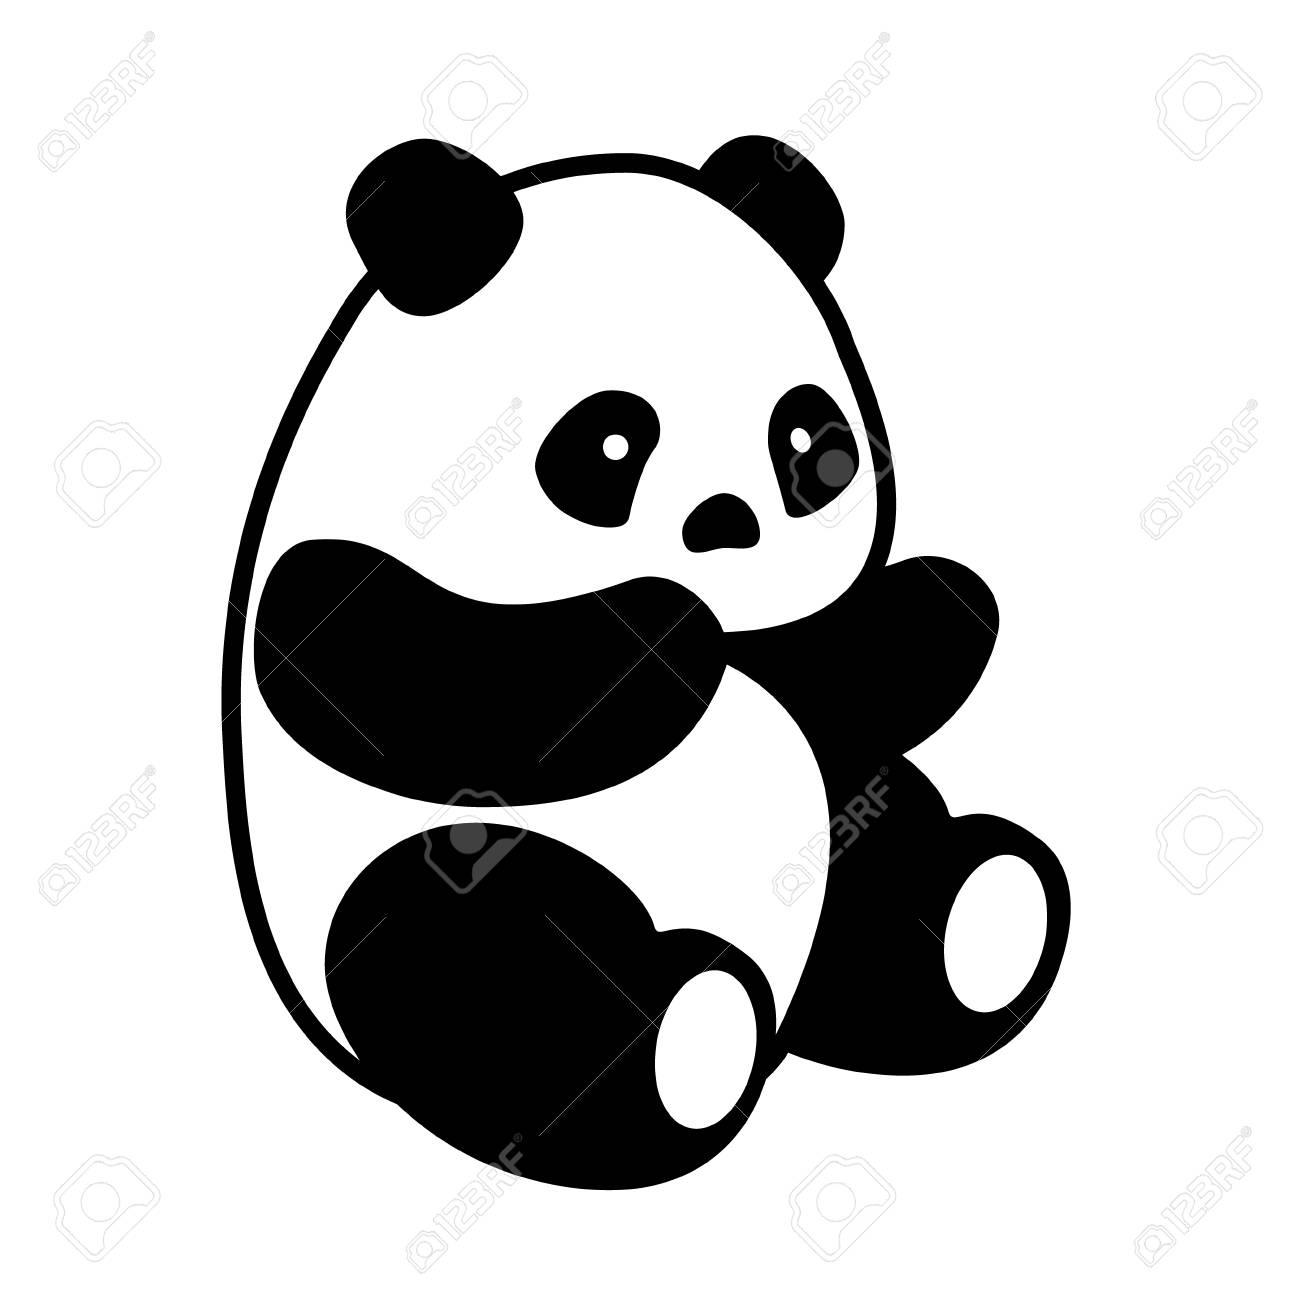 Ilustración De Vector Lindo Oso Panda Asiático De Dibujos Animados